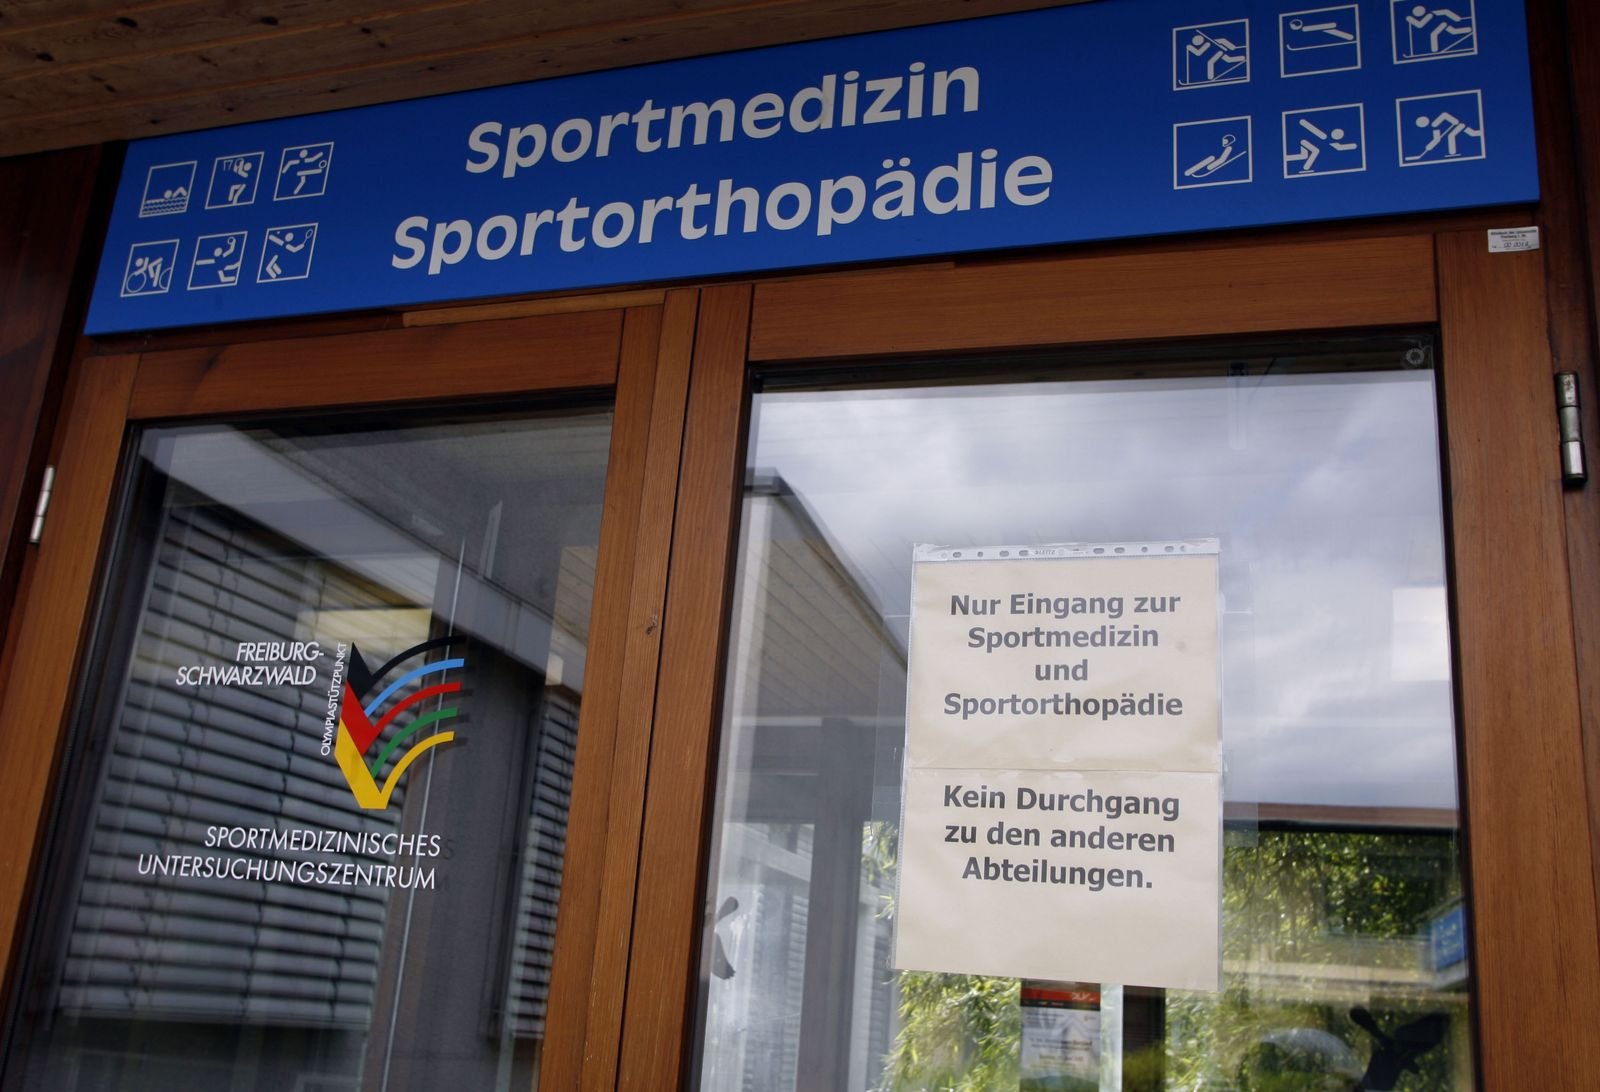 Sportmedizin/ Universitätsklinikum Freiburg